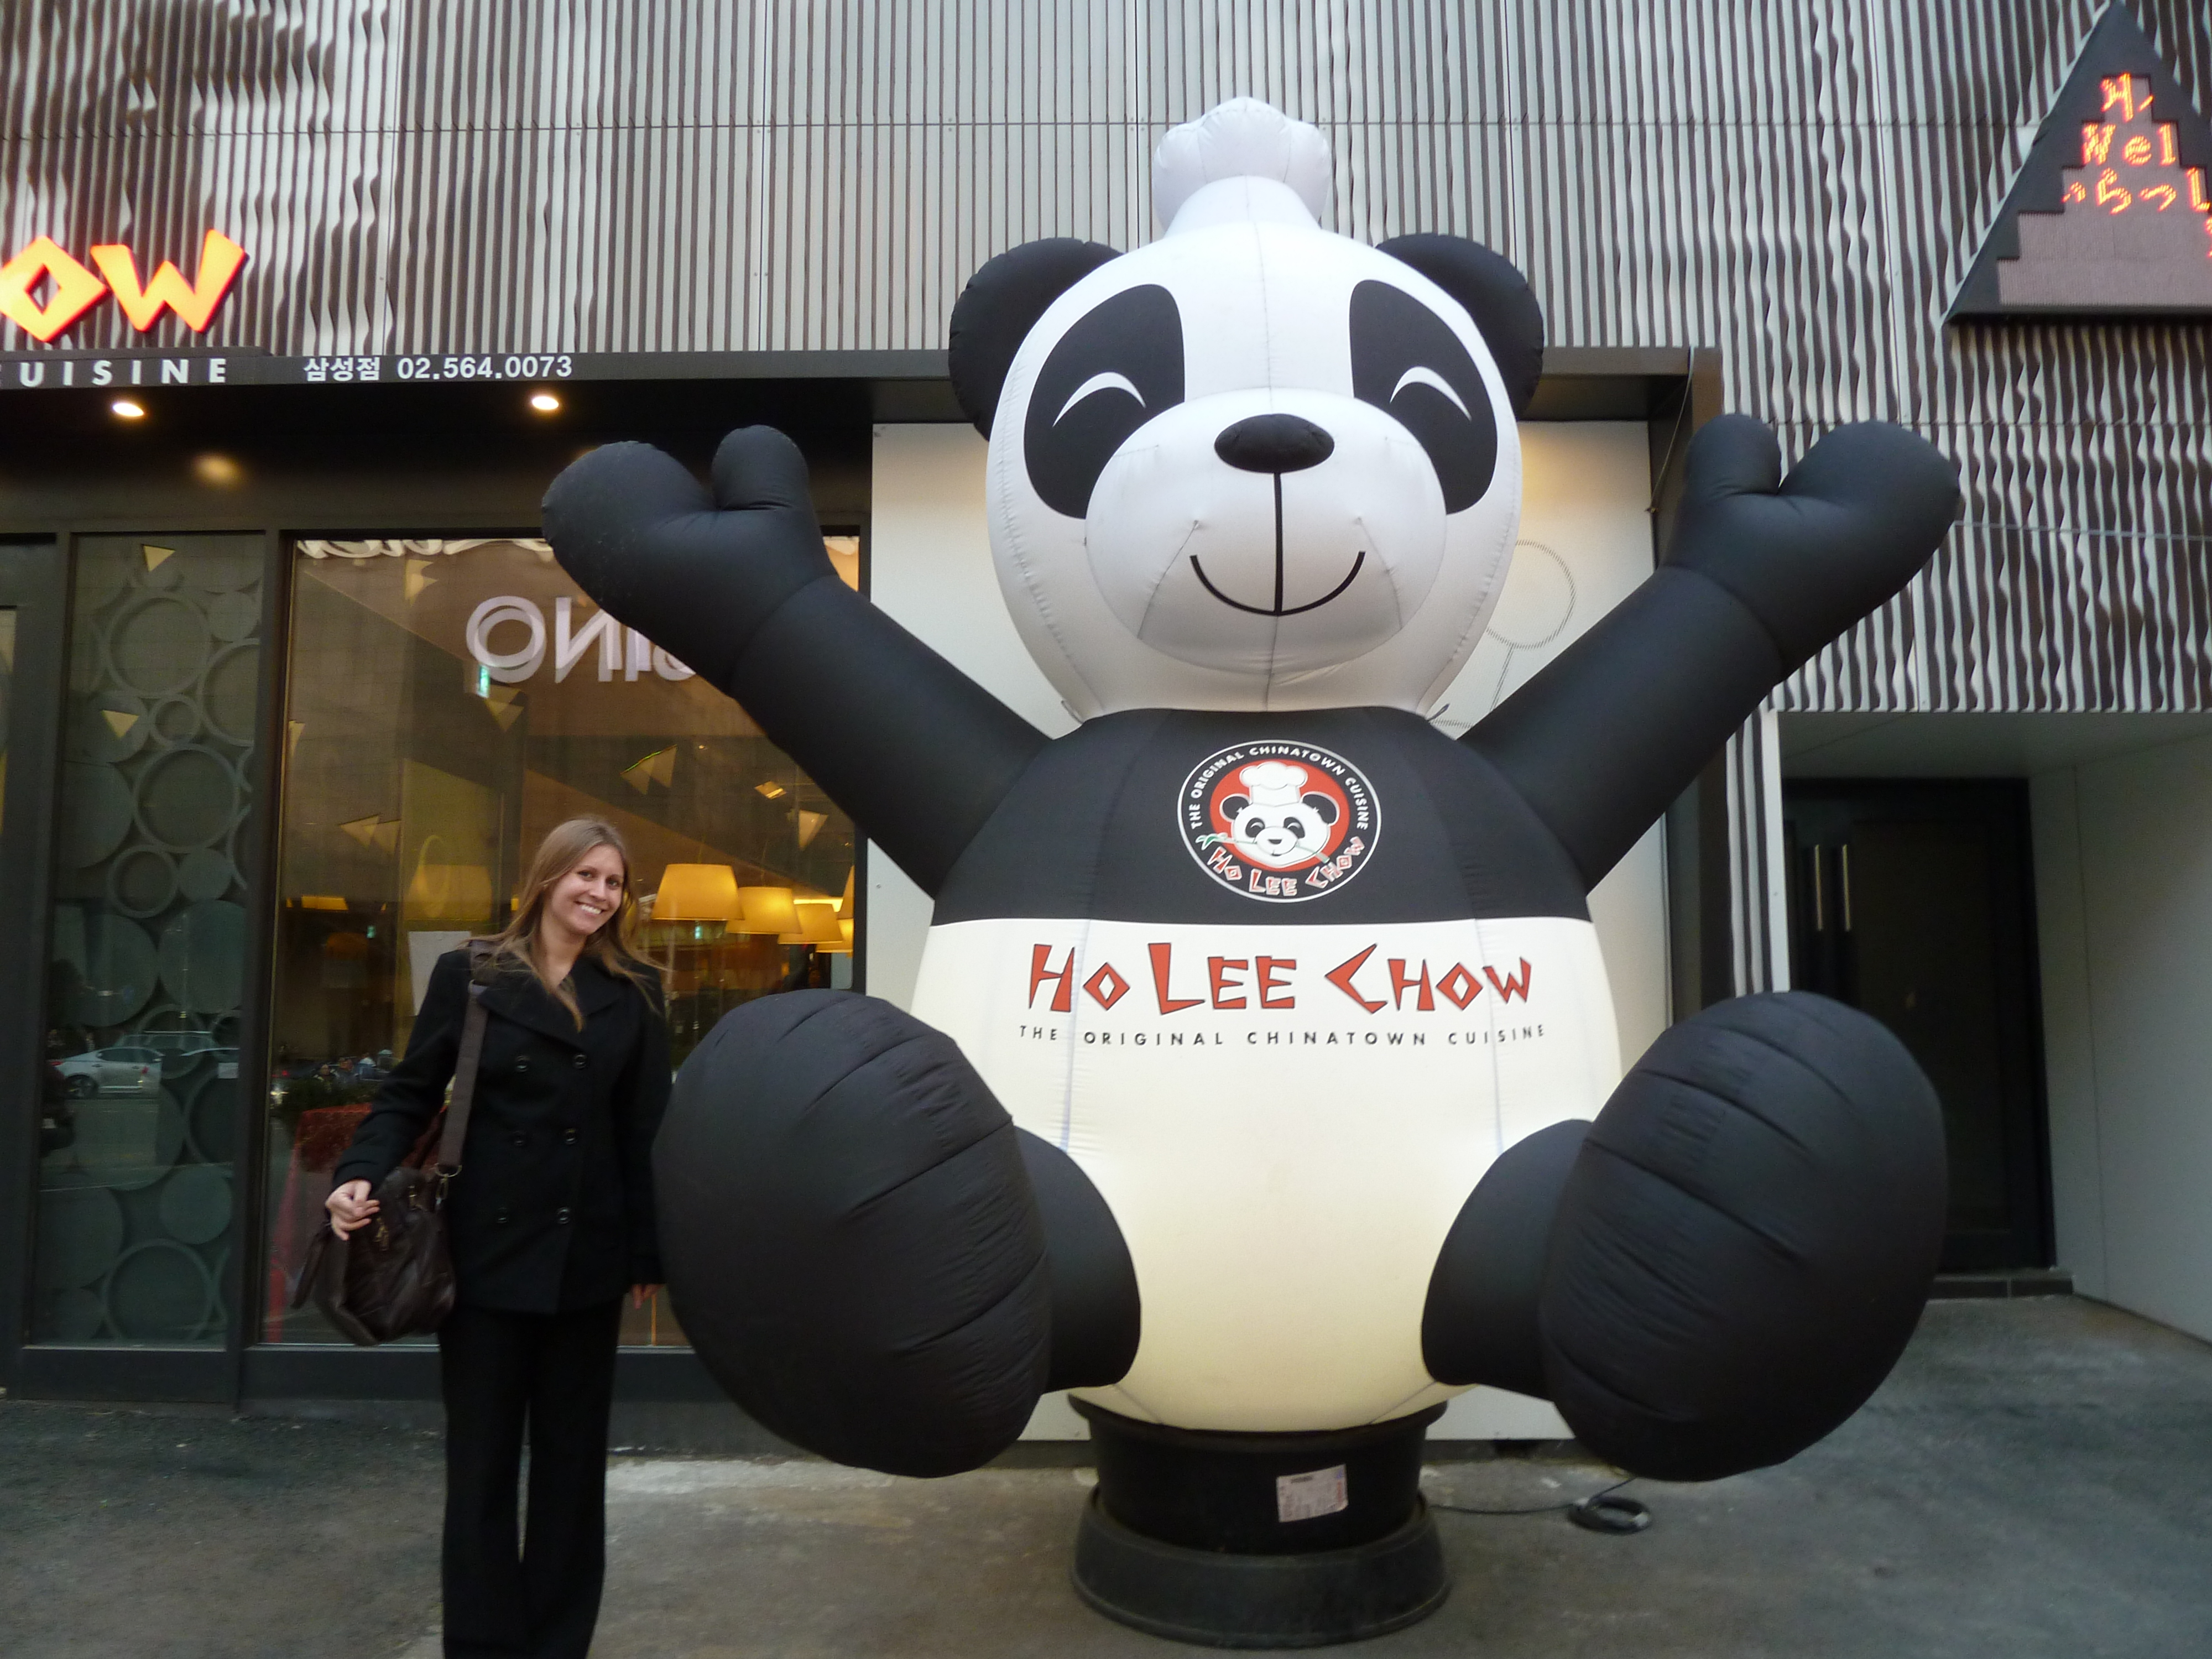 Holy Chow big panda | Allison Merten